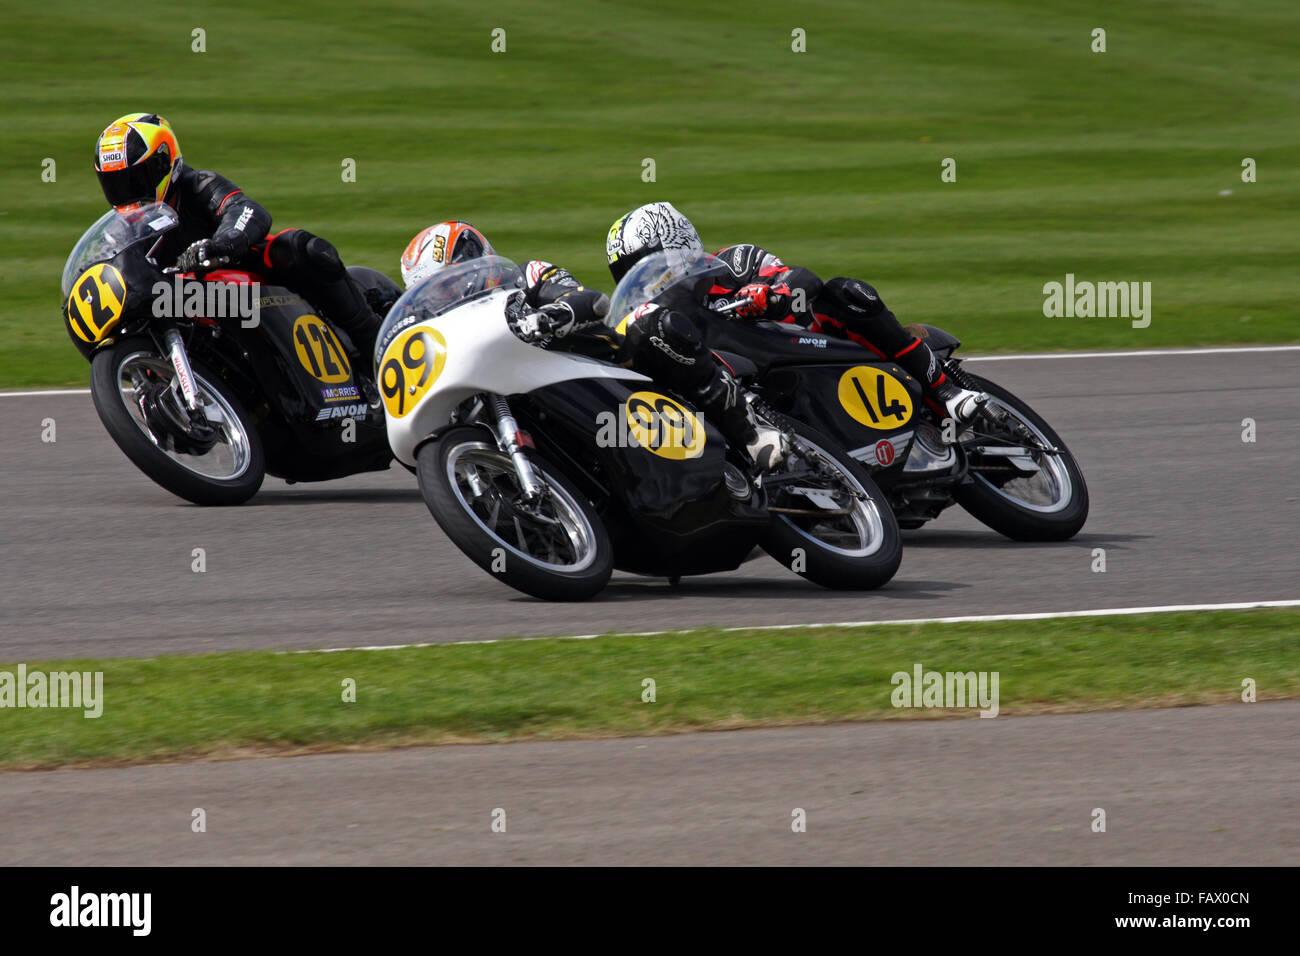 2 Norton Manx 500 & 1 Matchless G50 racing at Goodwood Revival 2015 - Stock Image